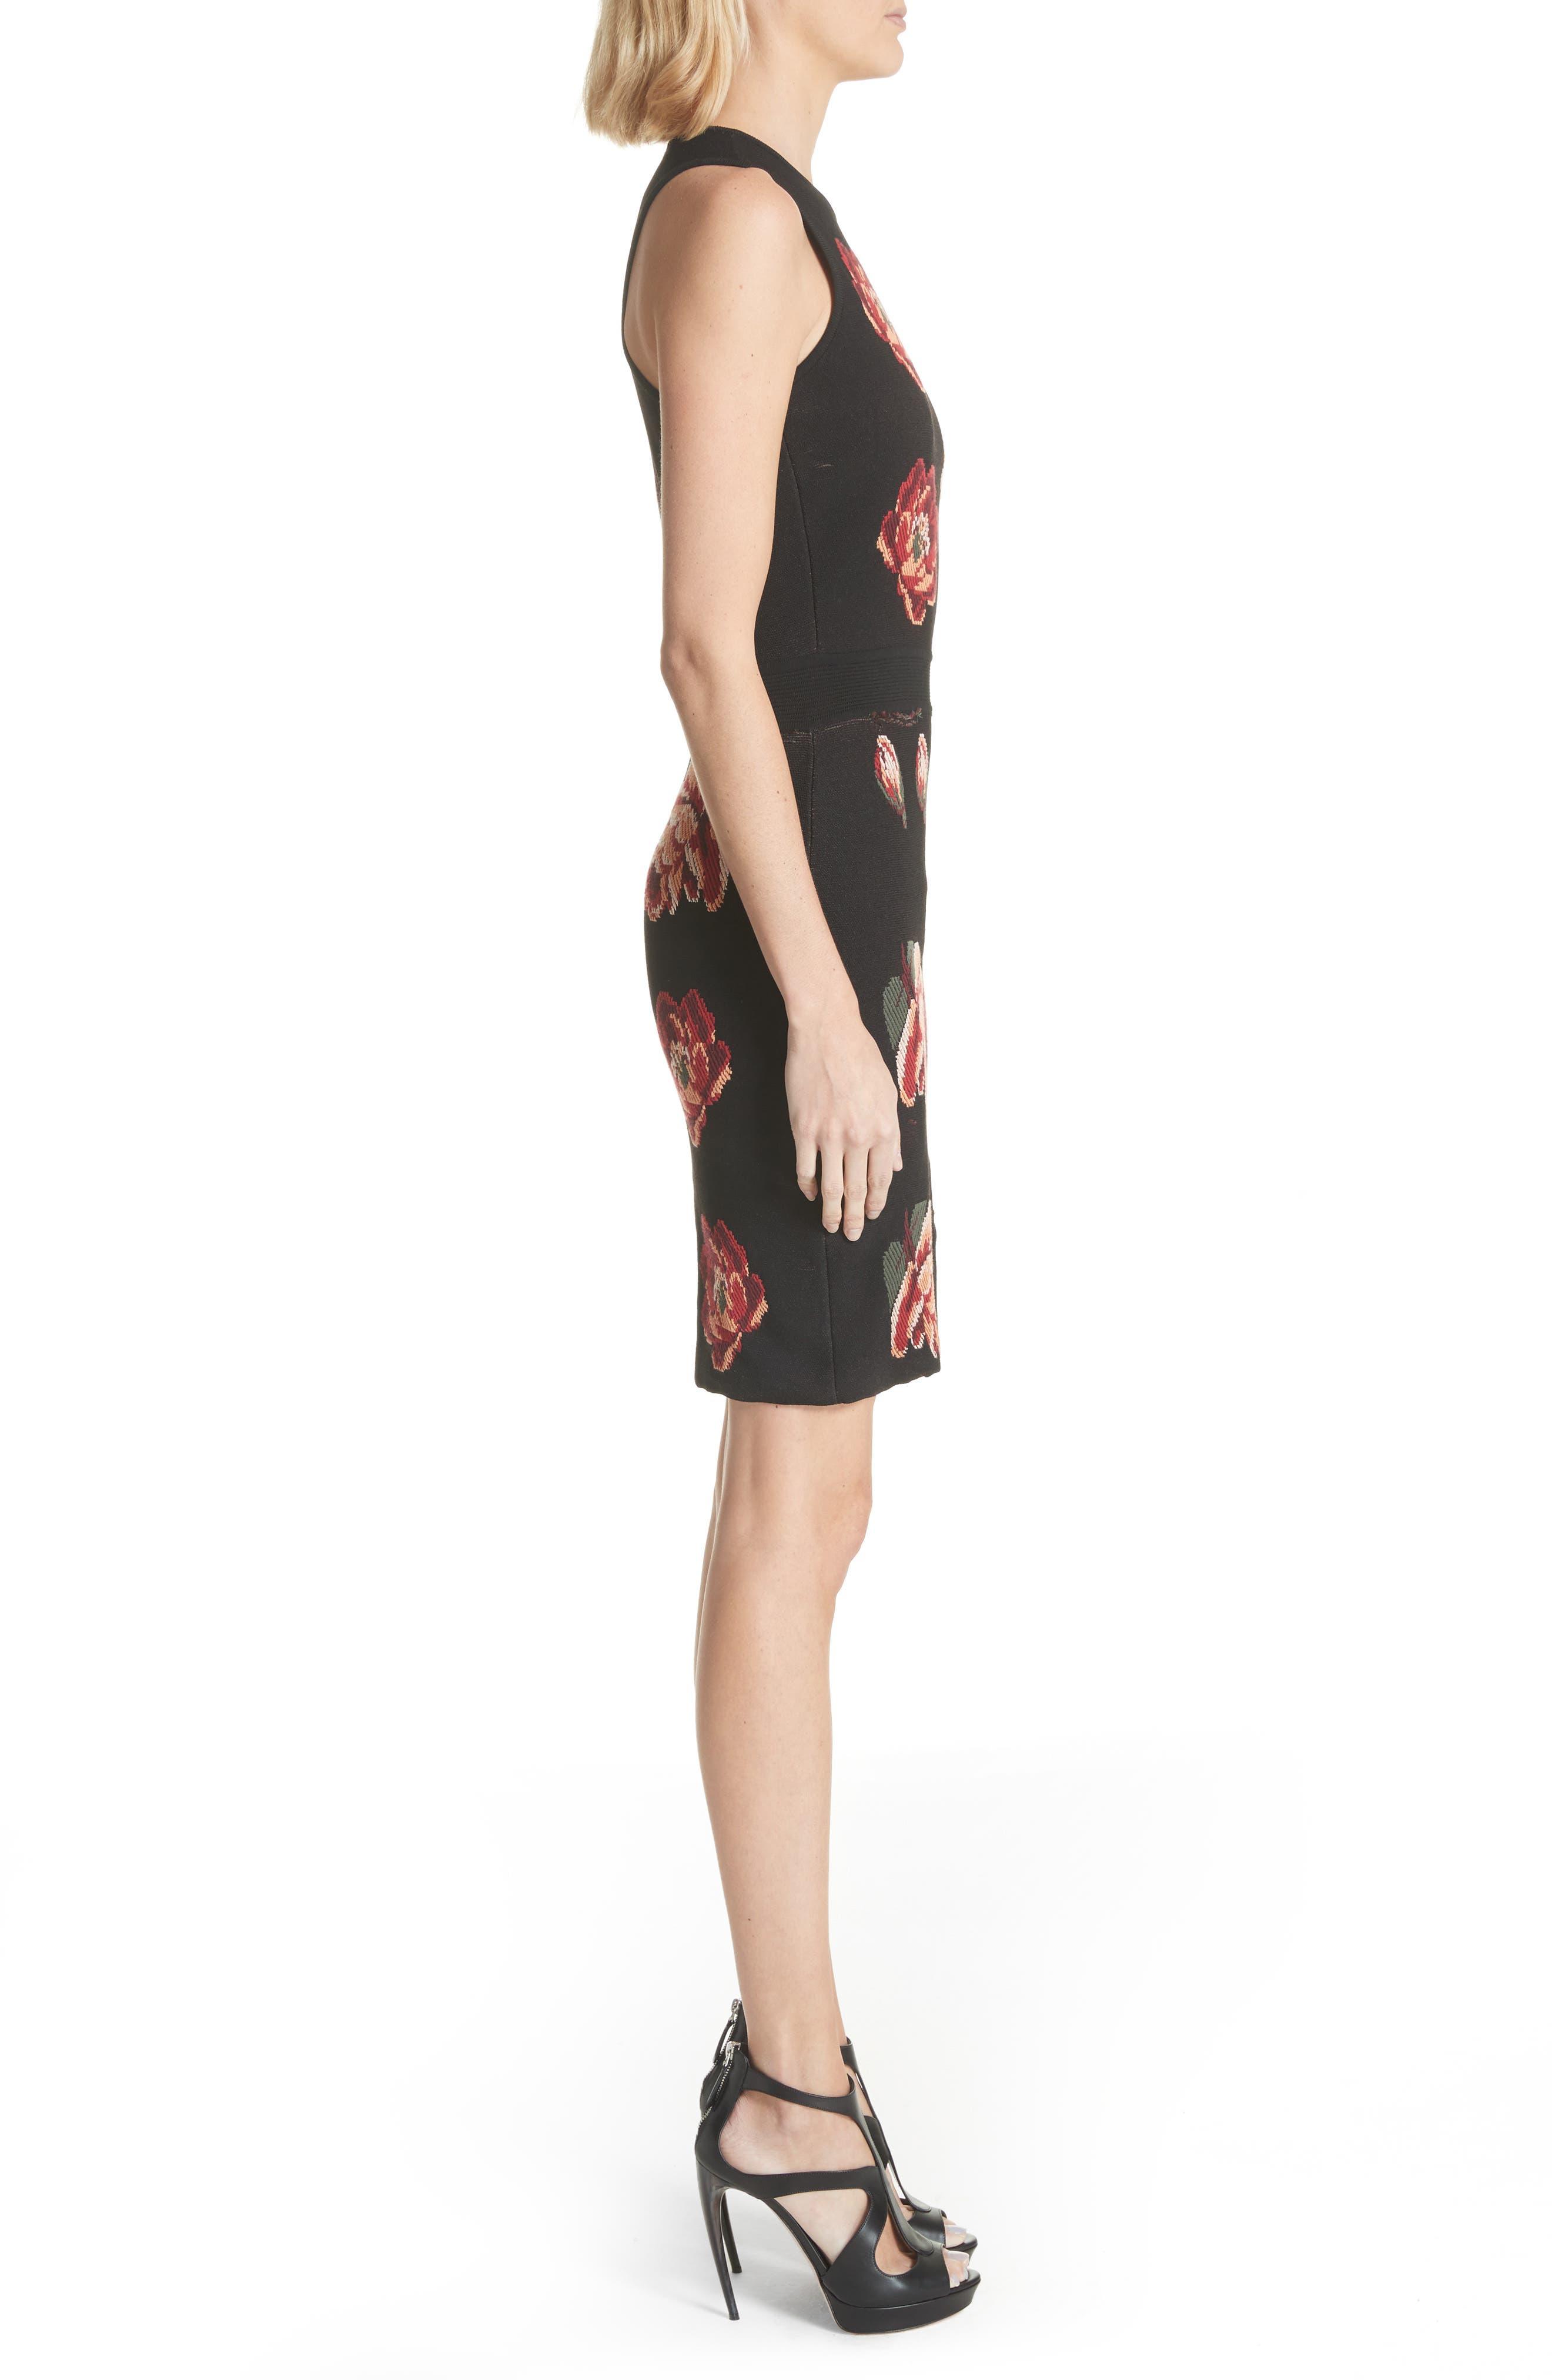 Intarsia Floral Print Dress,                             Alternate thumbnail 3, color,                             Black/ Red/ Green